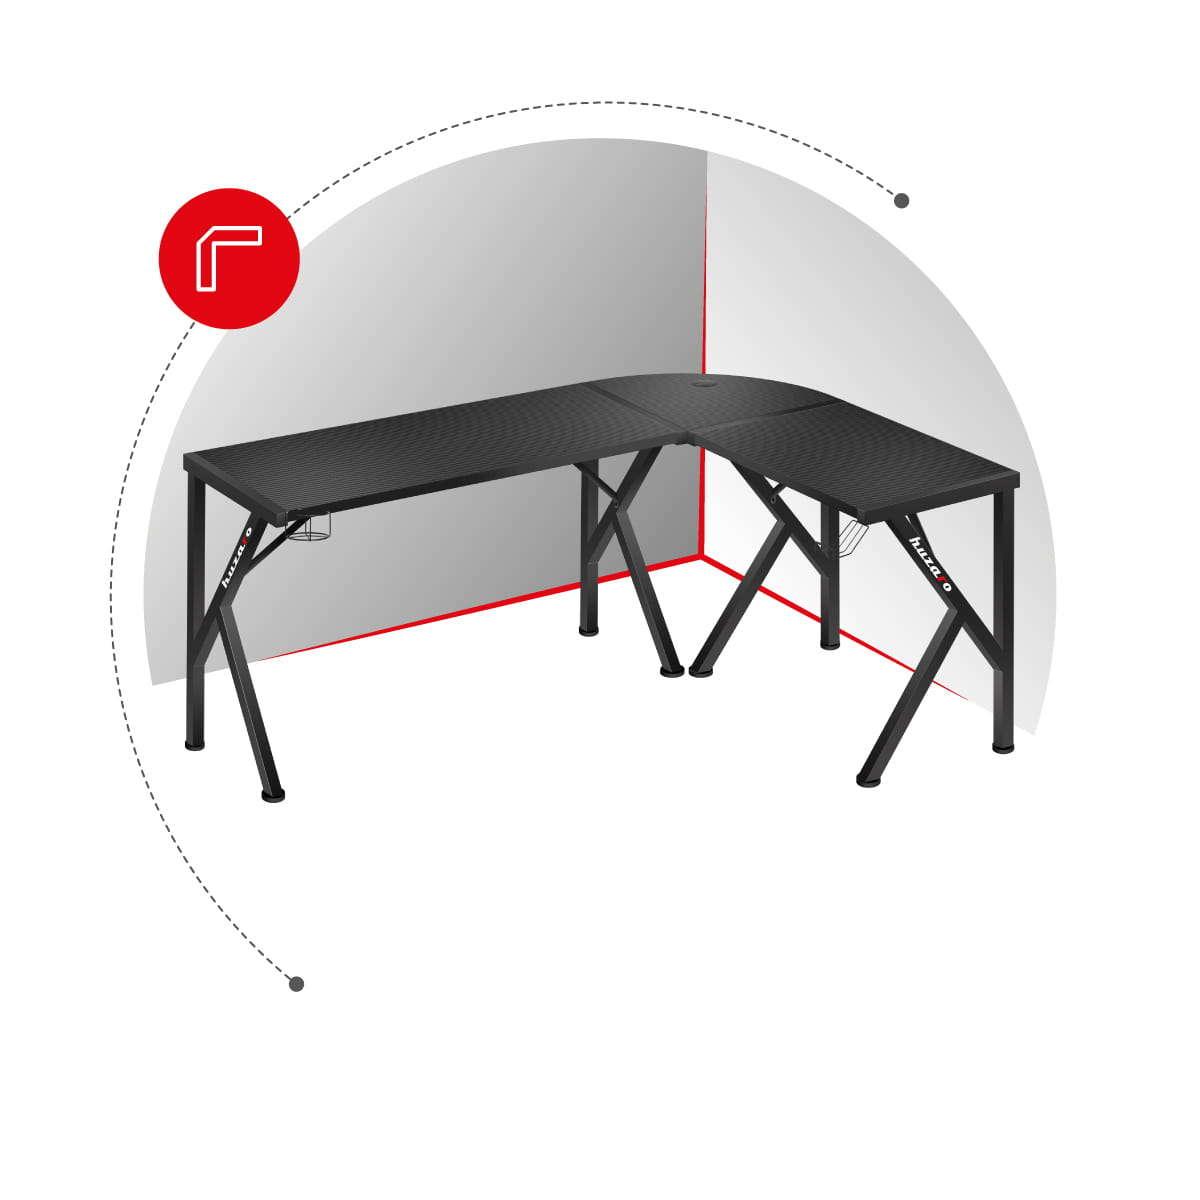 Hero 6.3 biurko narożnikowe